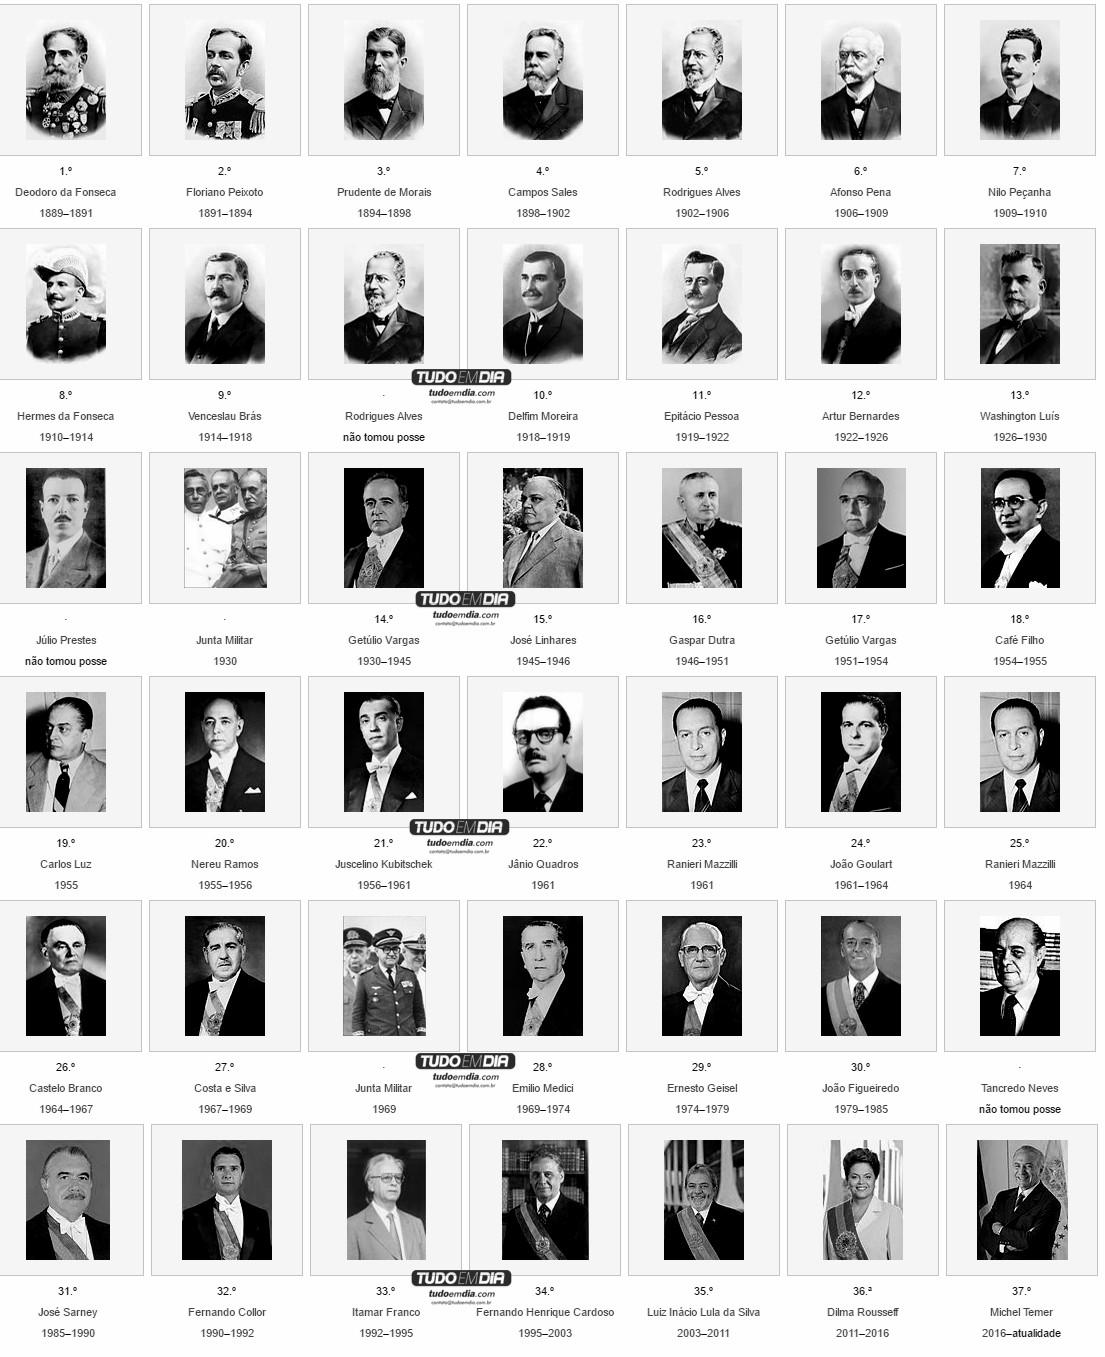 presidentes-do-brasil